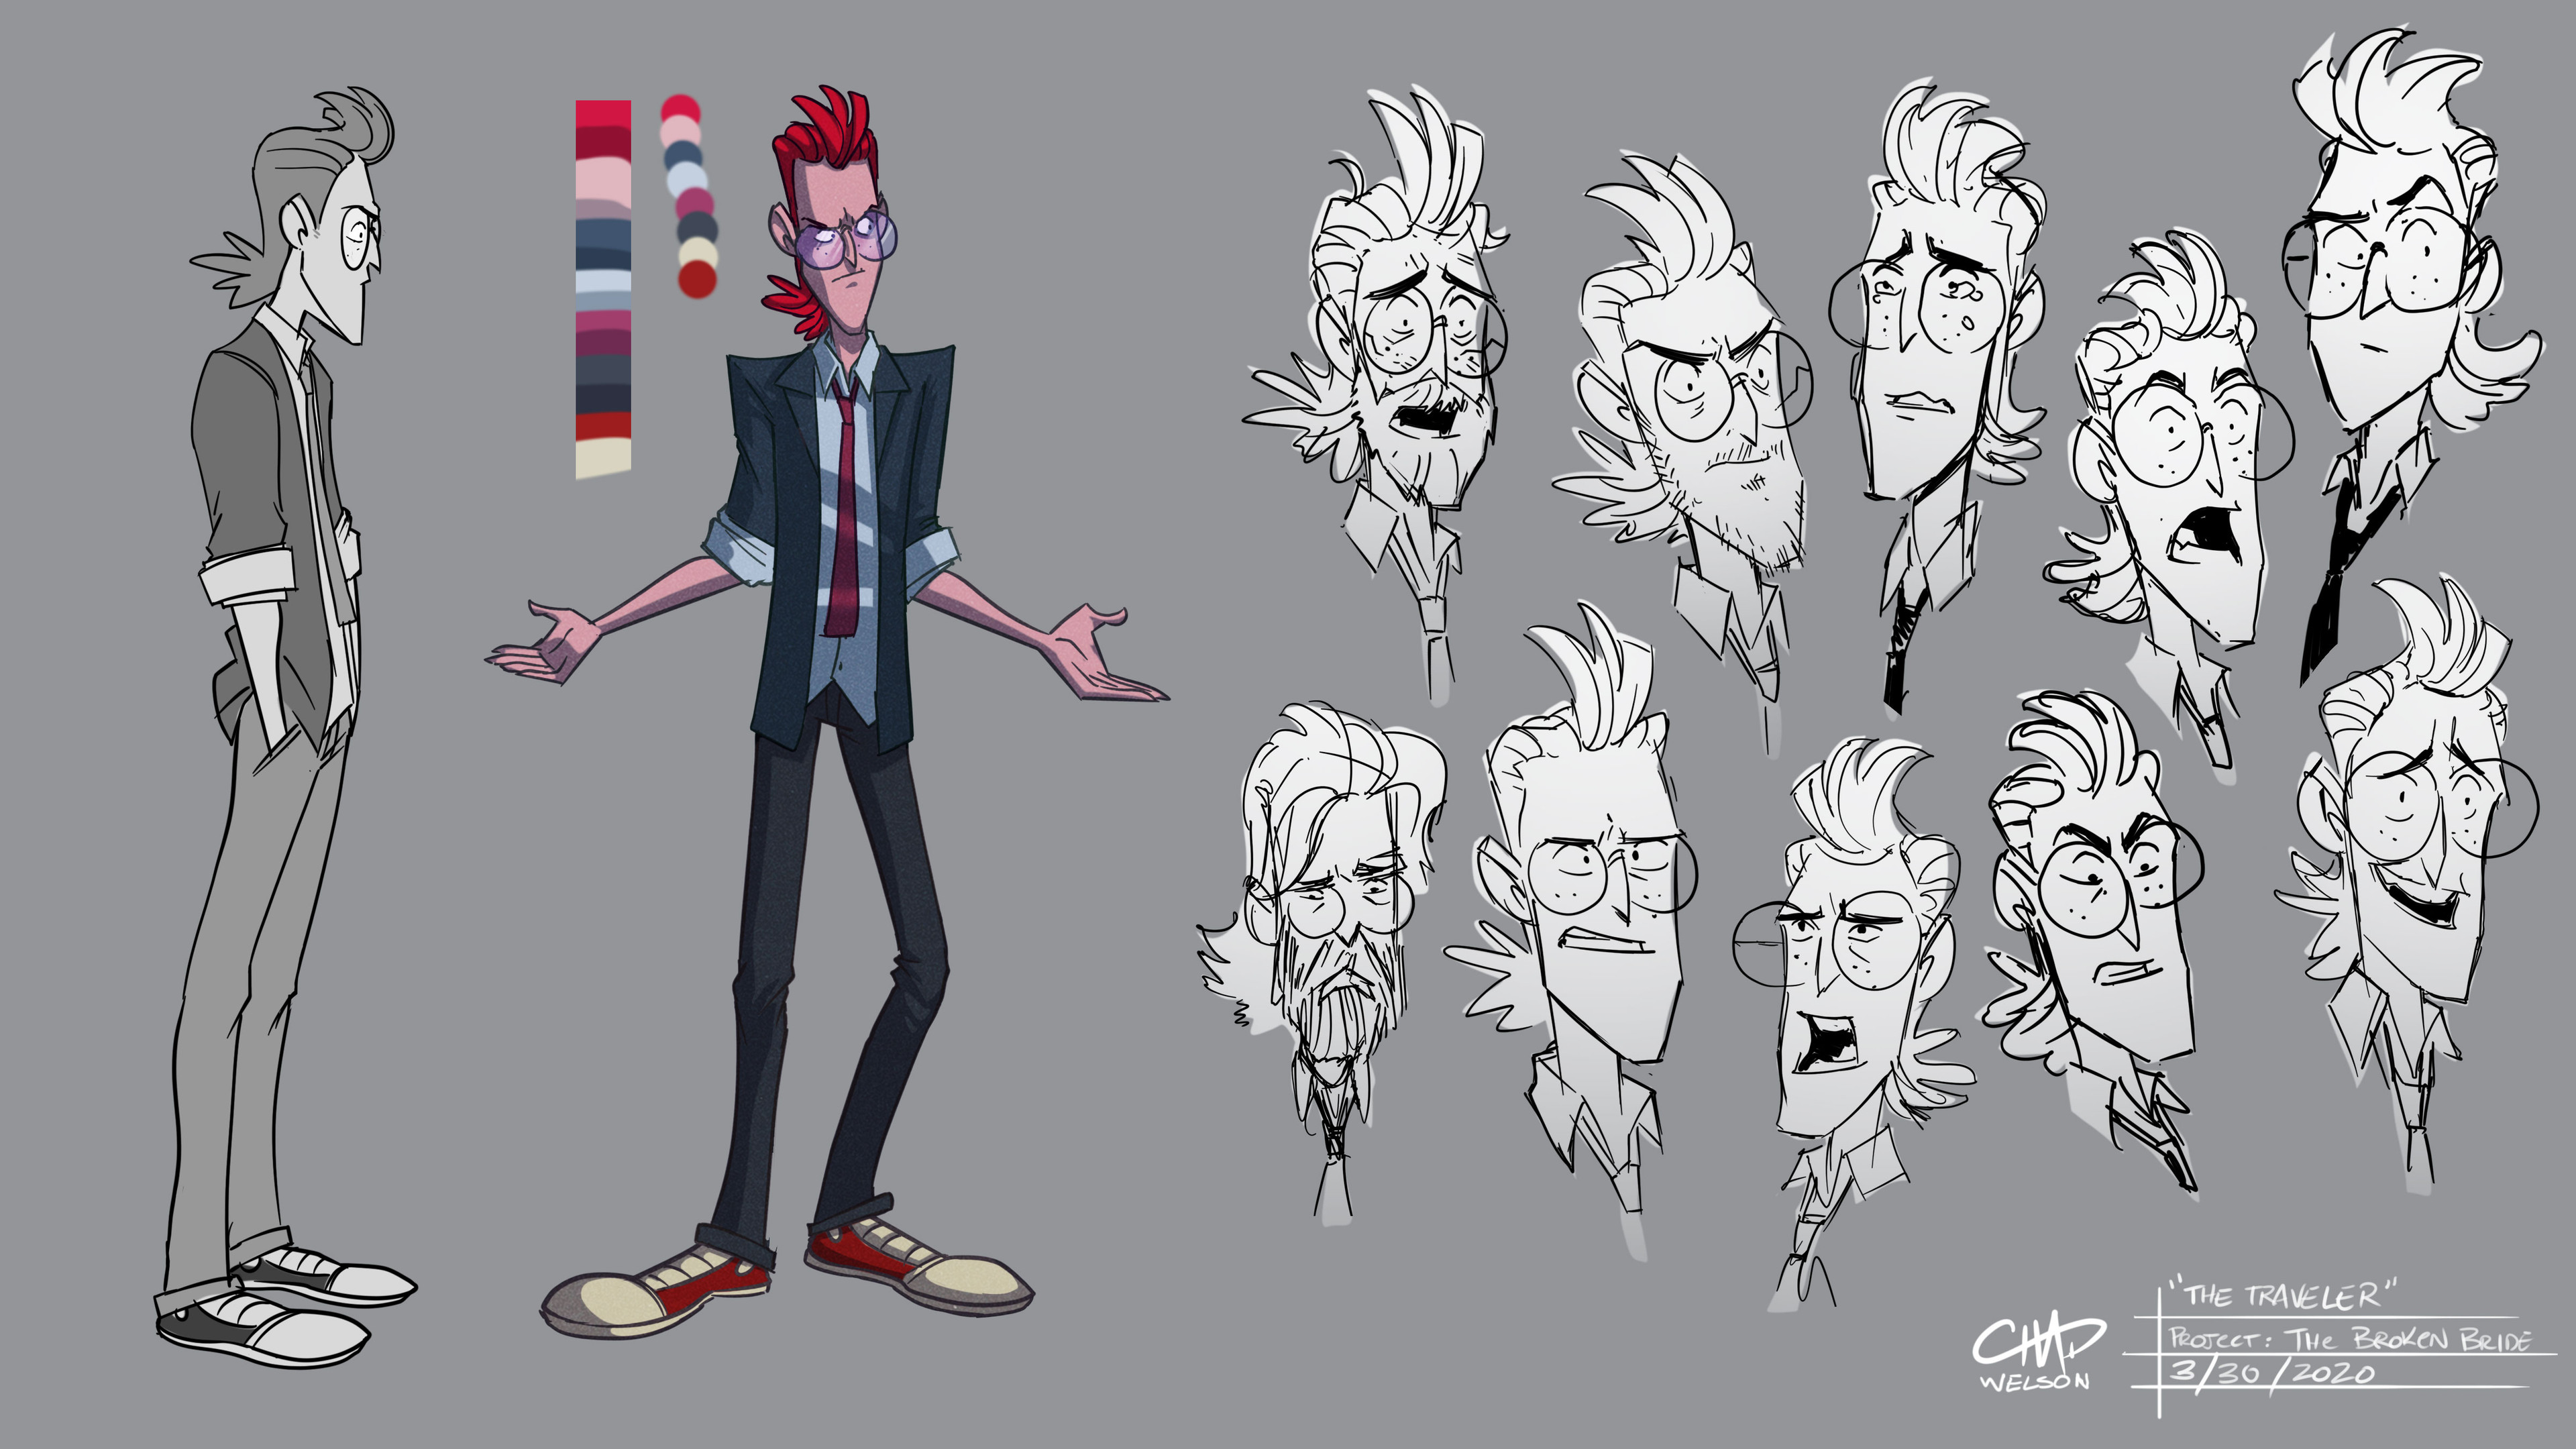 """The Traveler,"" final character design"